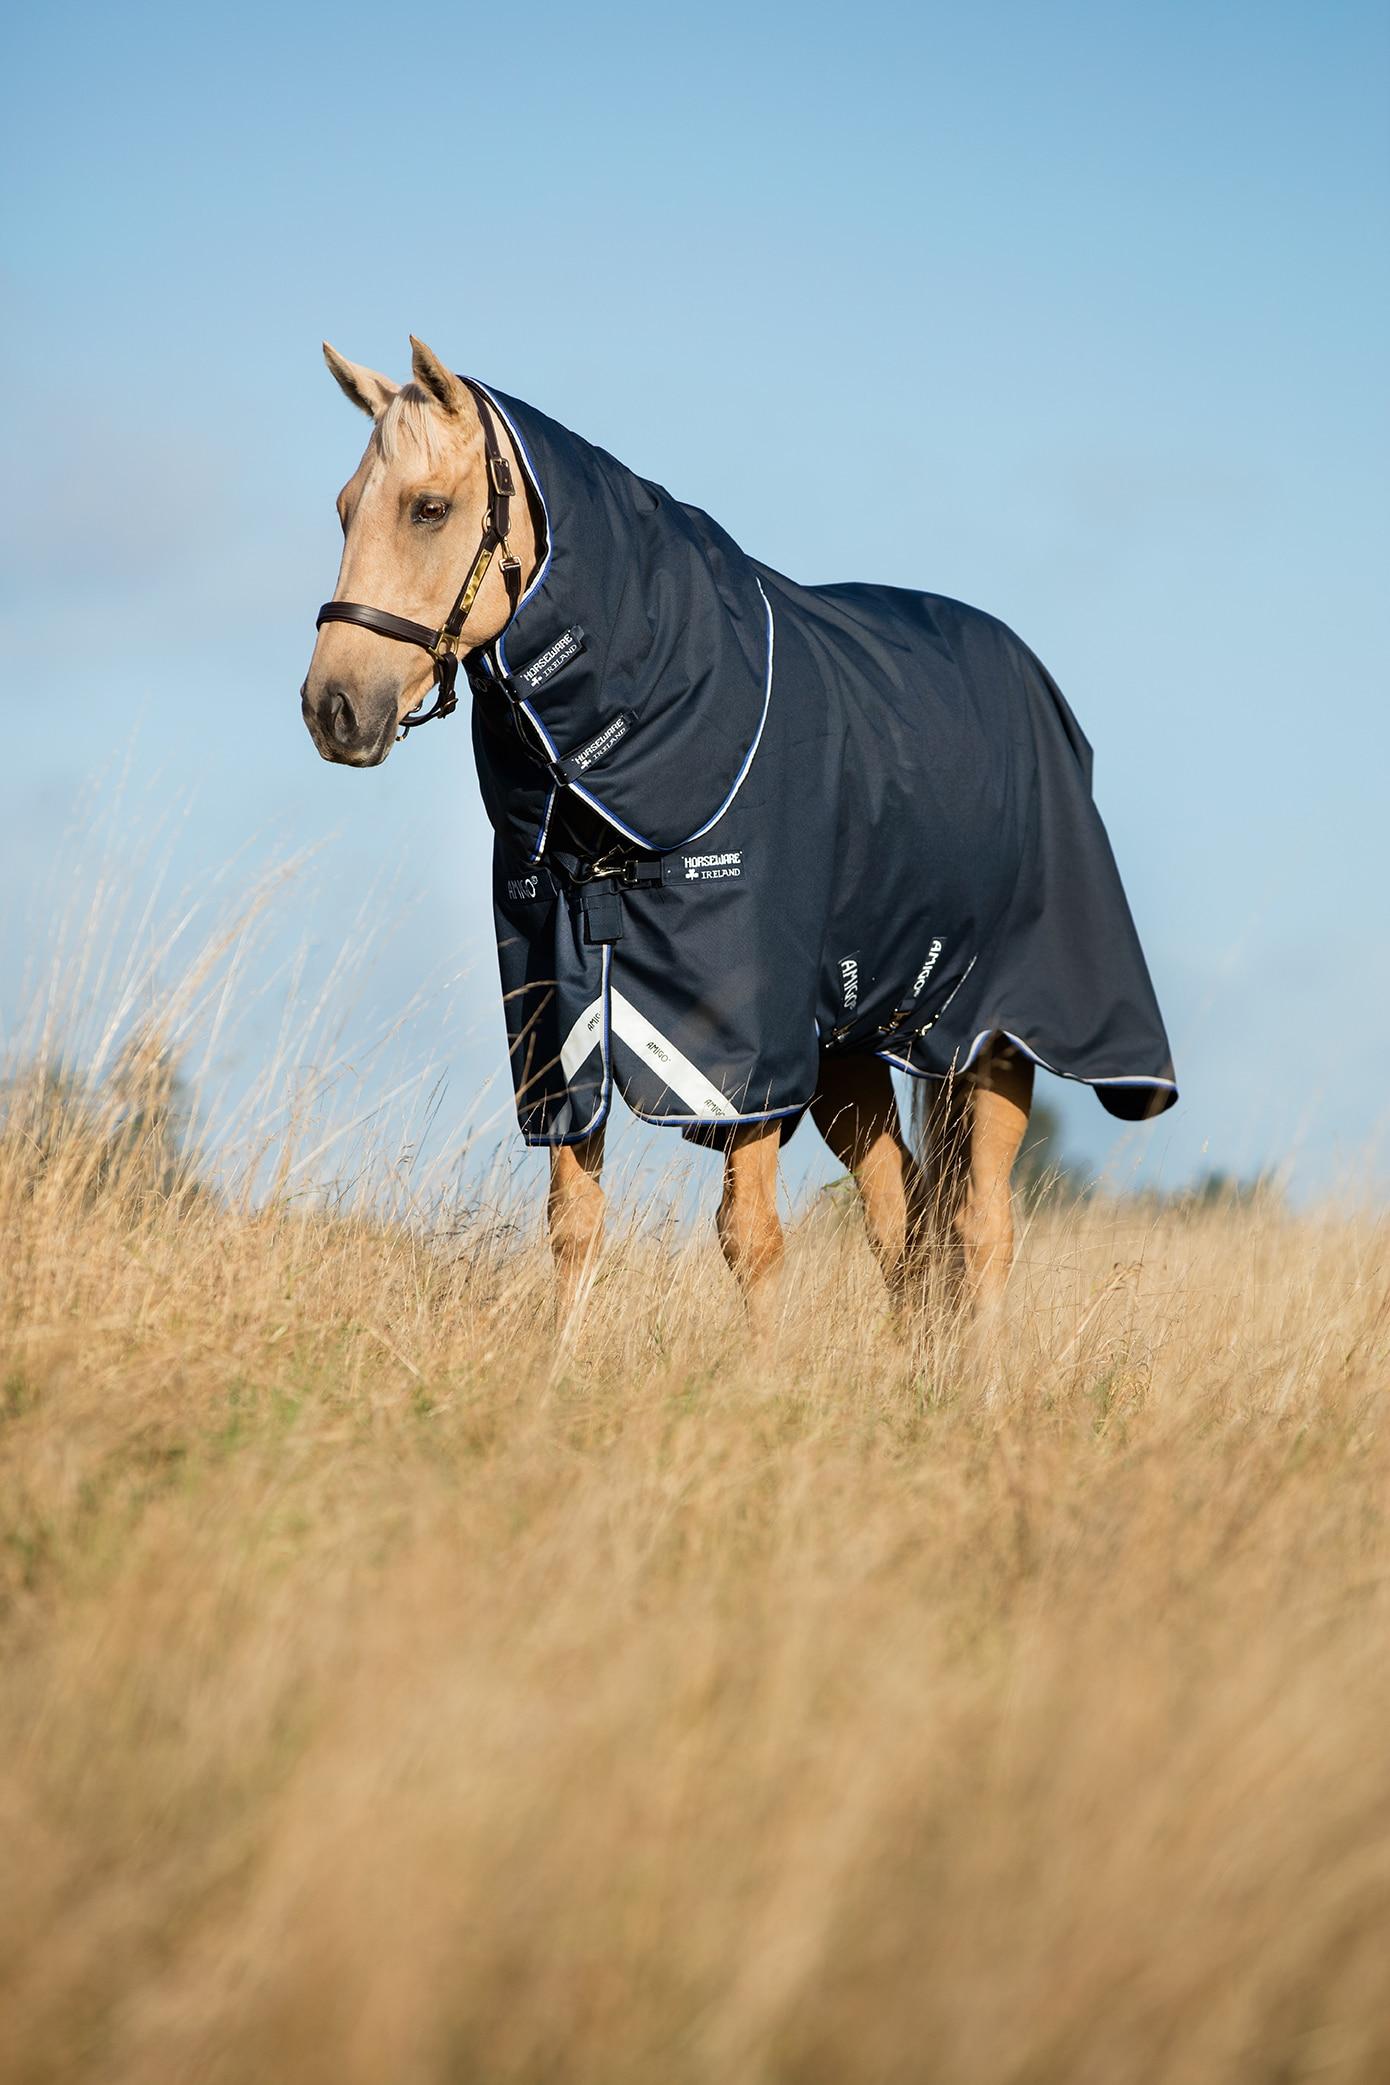 Horseware Amigo Bravo 12 Plus tykt vinterdekken, 400 gram